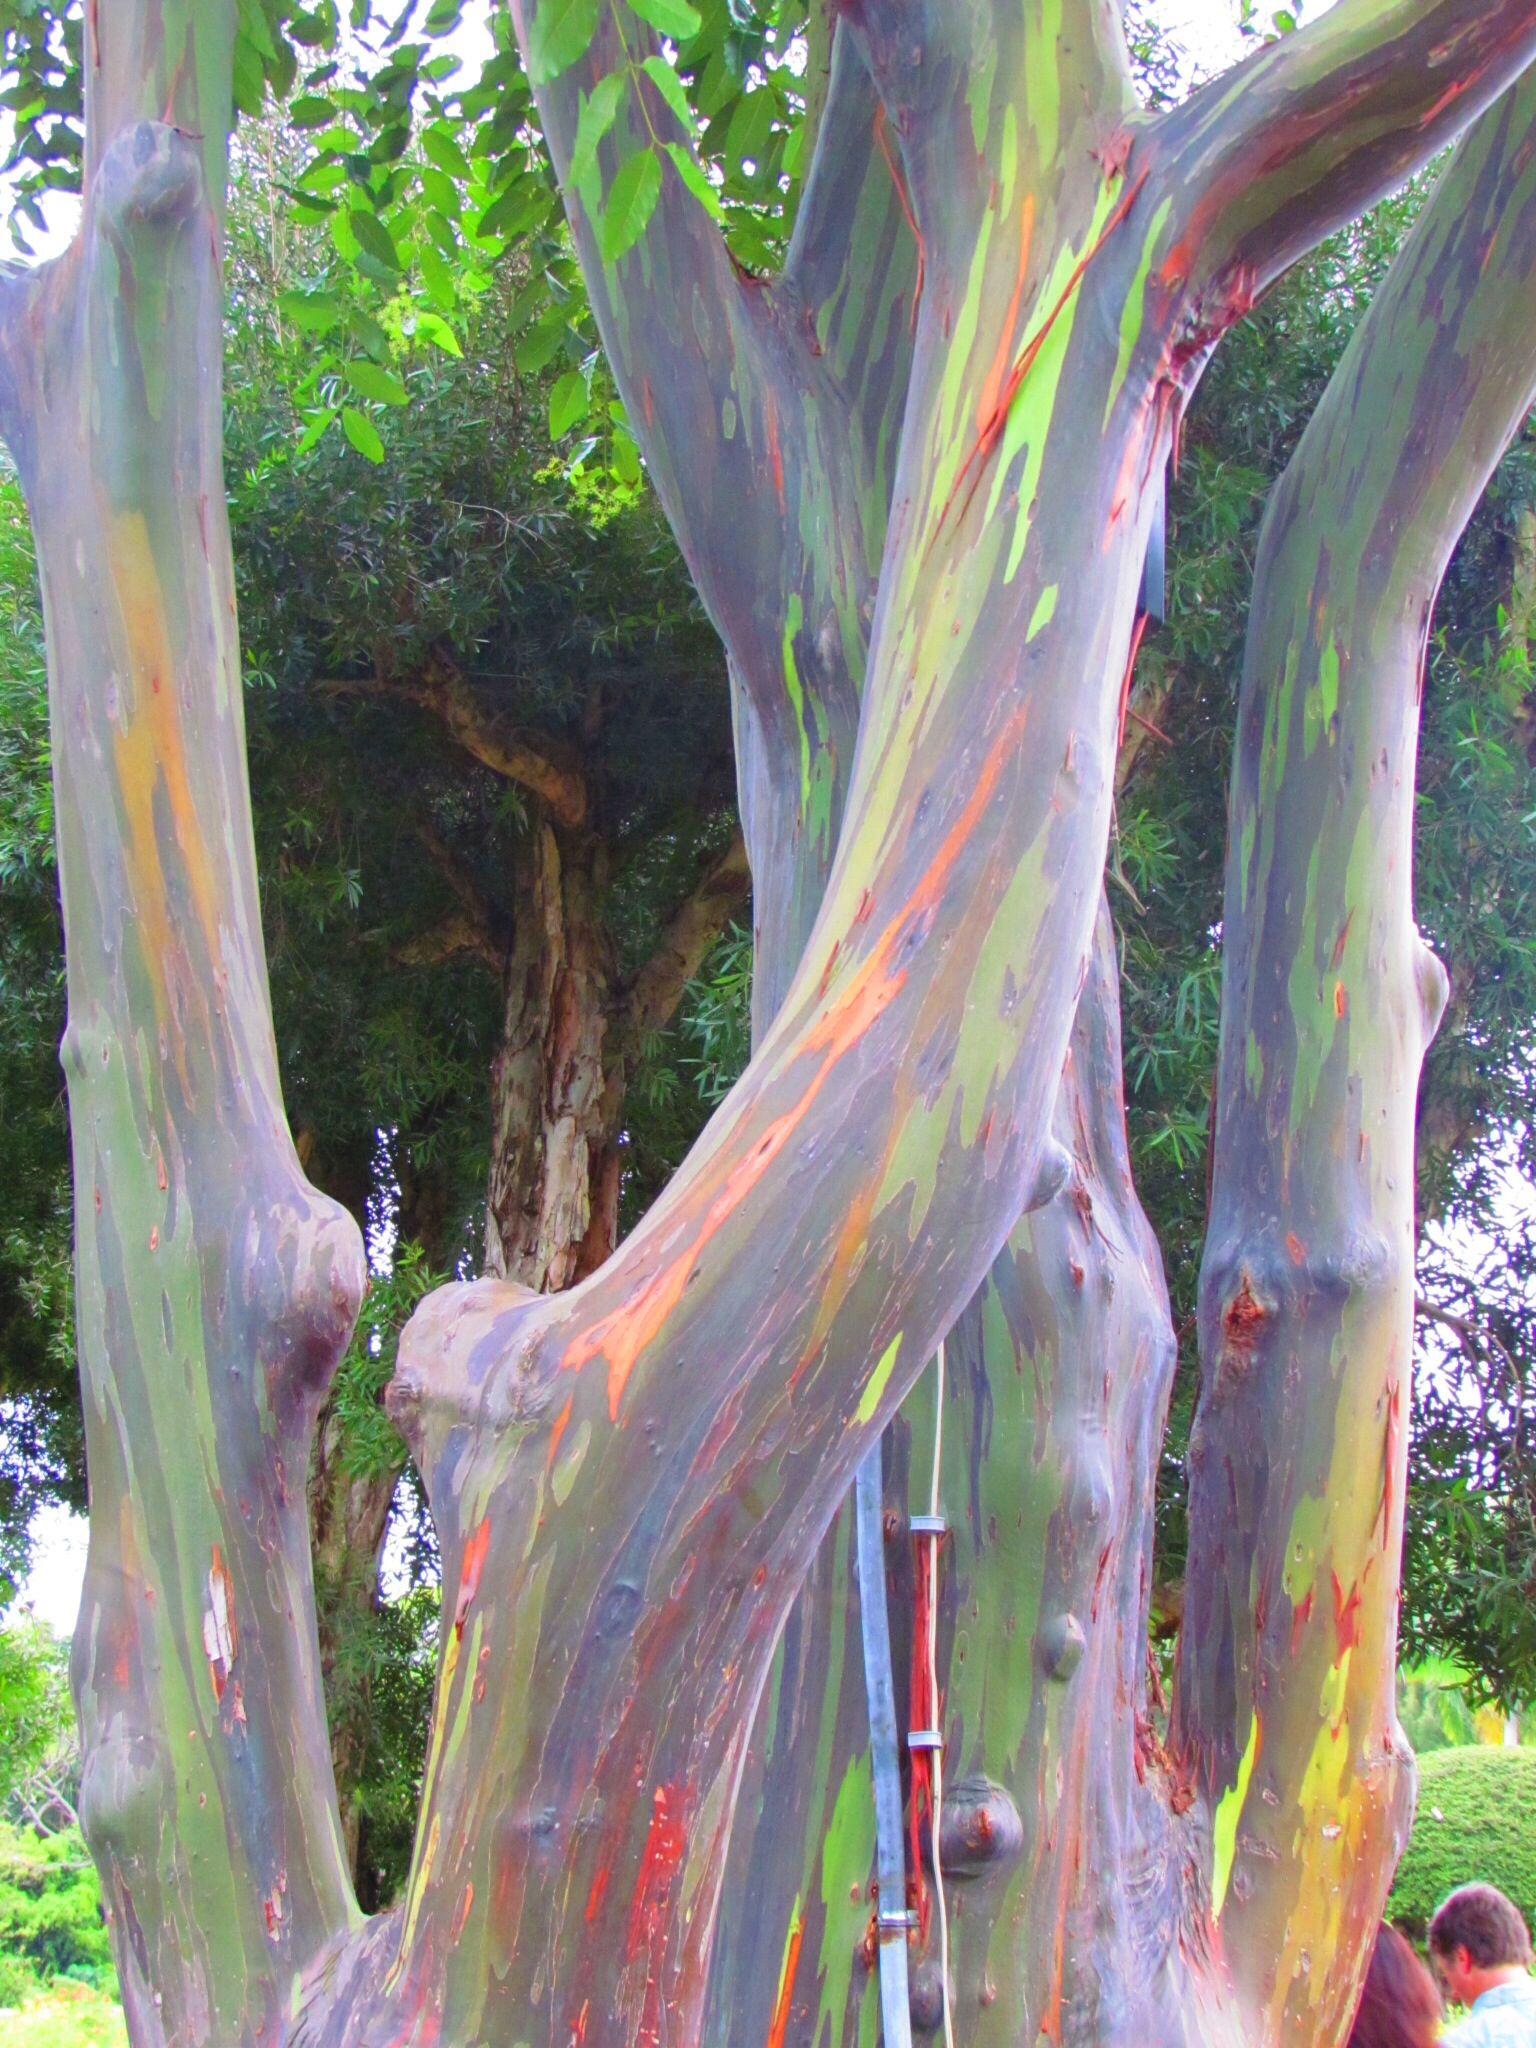 Rainbow Eucalyptus Hana Maui Hawaii The Unusual Phenomenon Is Caused By Patches Of Bark Shedding A Rainbow Eucalyptus Rainbow Eucalyptus Tree Rainbow Tree